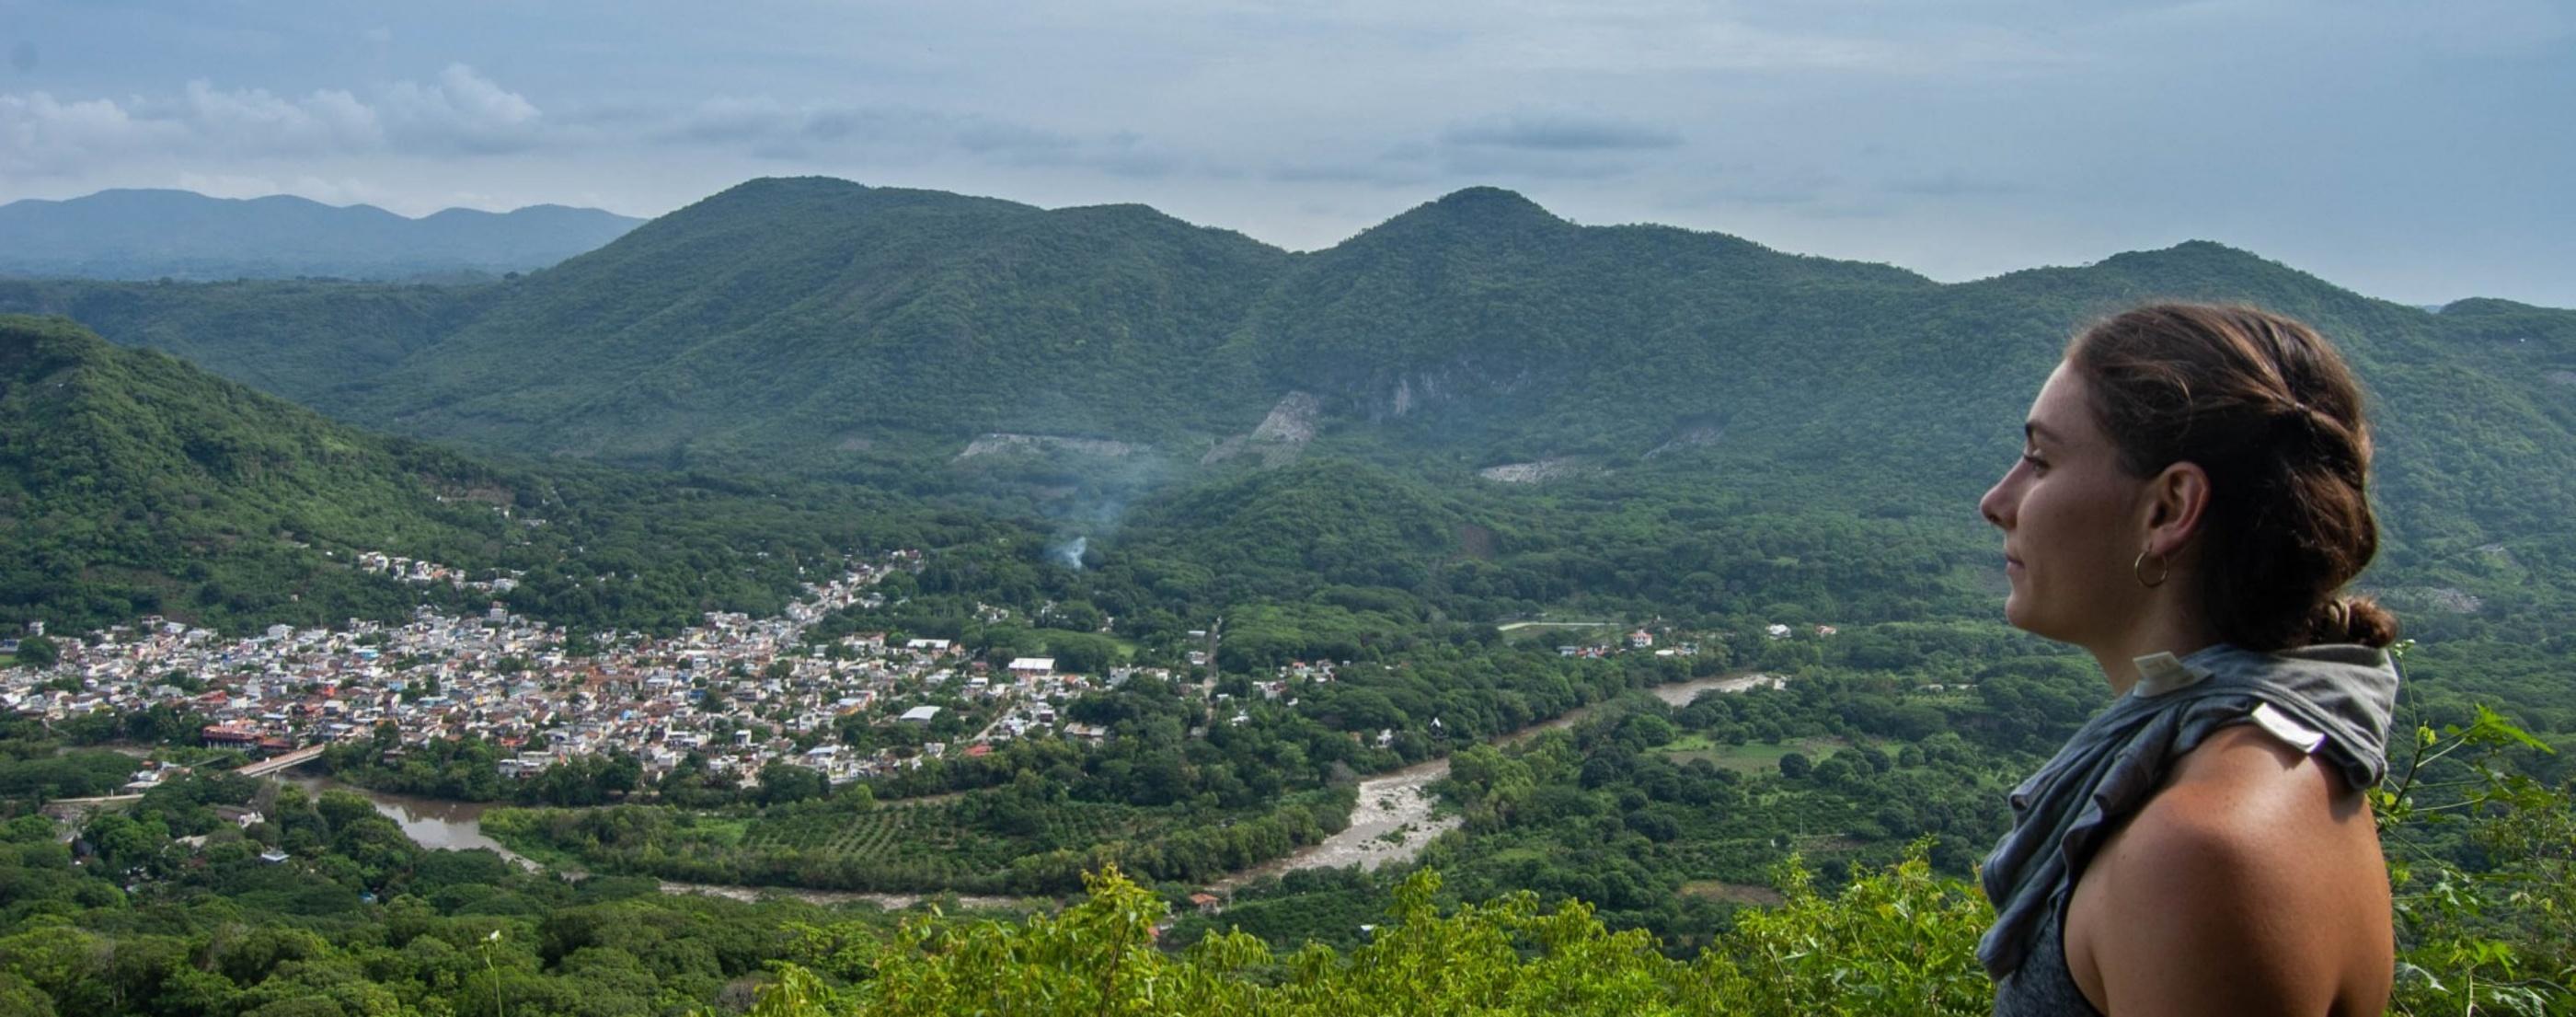 Picocanoa Rodavento